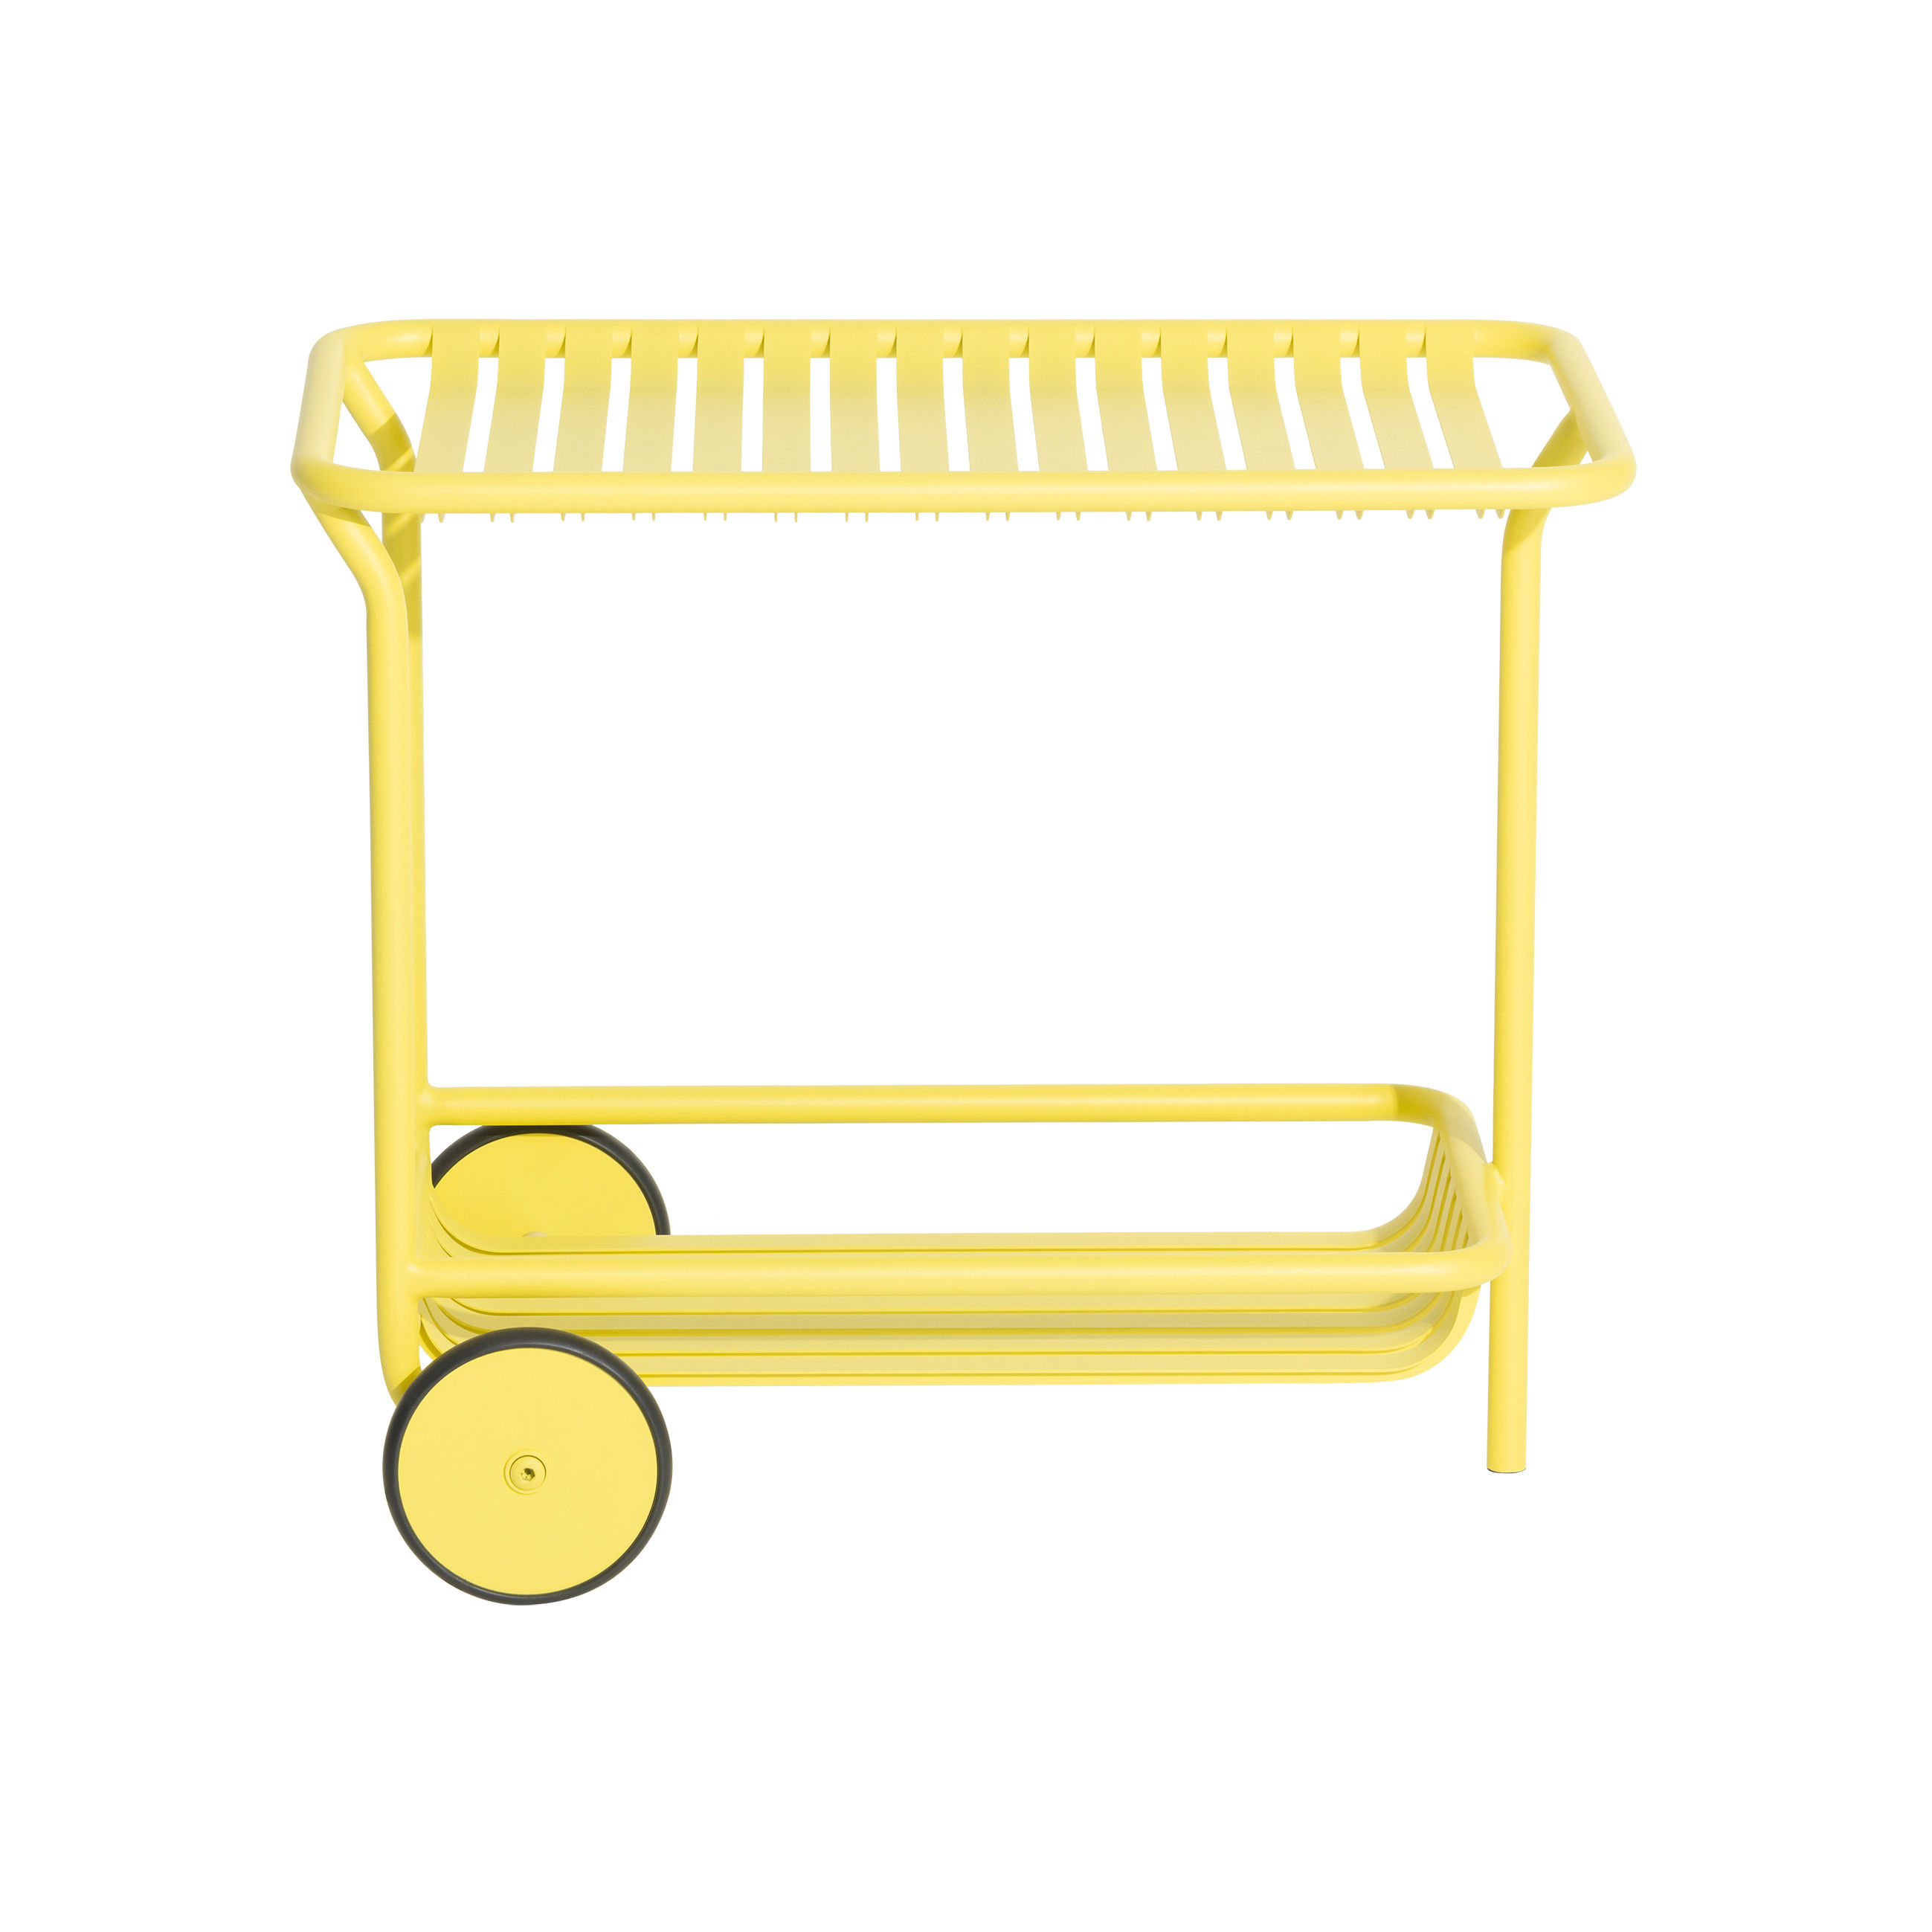 Furniture - Miscellaneous furniture - Week-End Dresser - / Aluminium - Casters by Petite Friture - Pale yellow - Powder coated epoxy aluminium